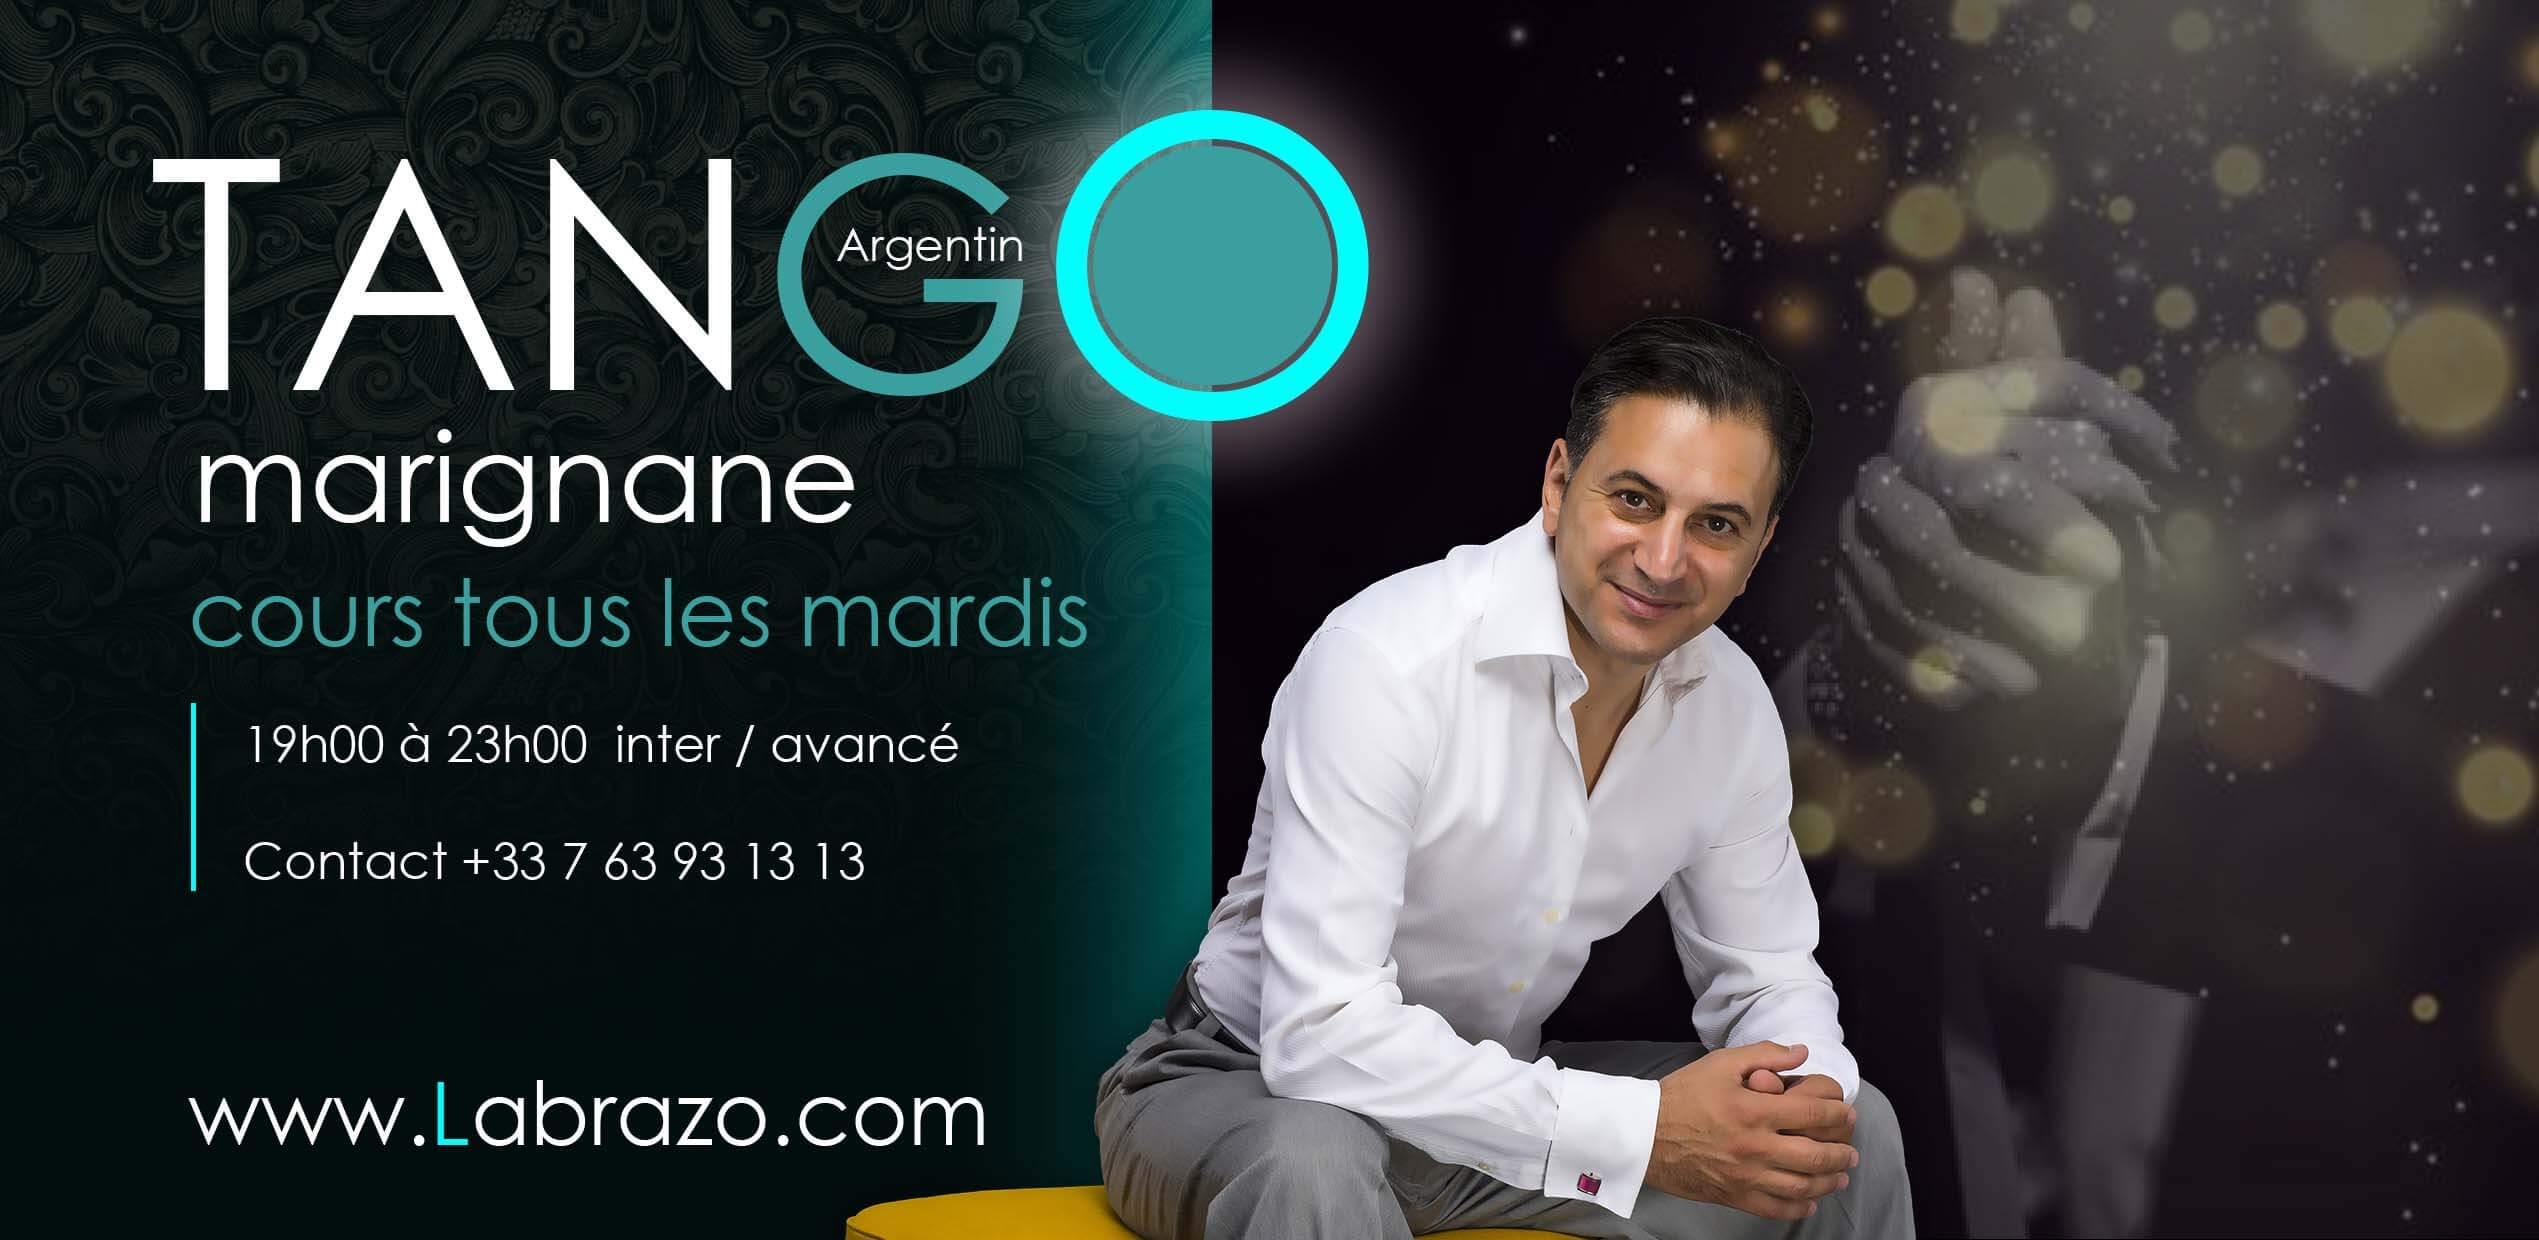 tango argentin a marignane